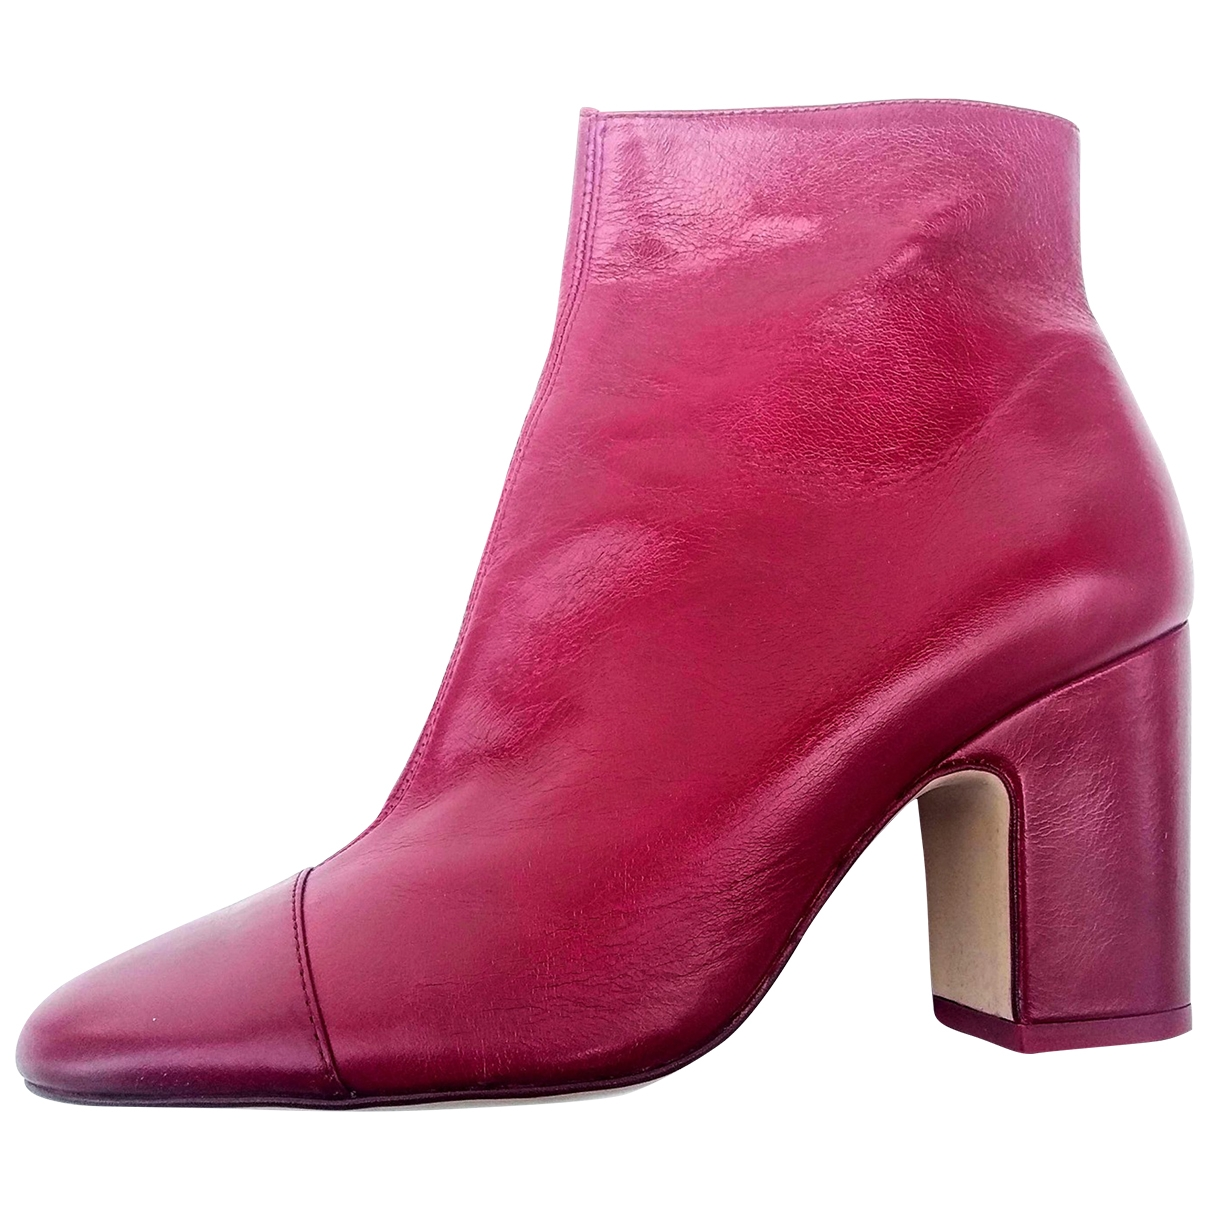 Zara \N Burgundy Leather Ankle boots for Women 39 EU